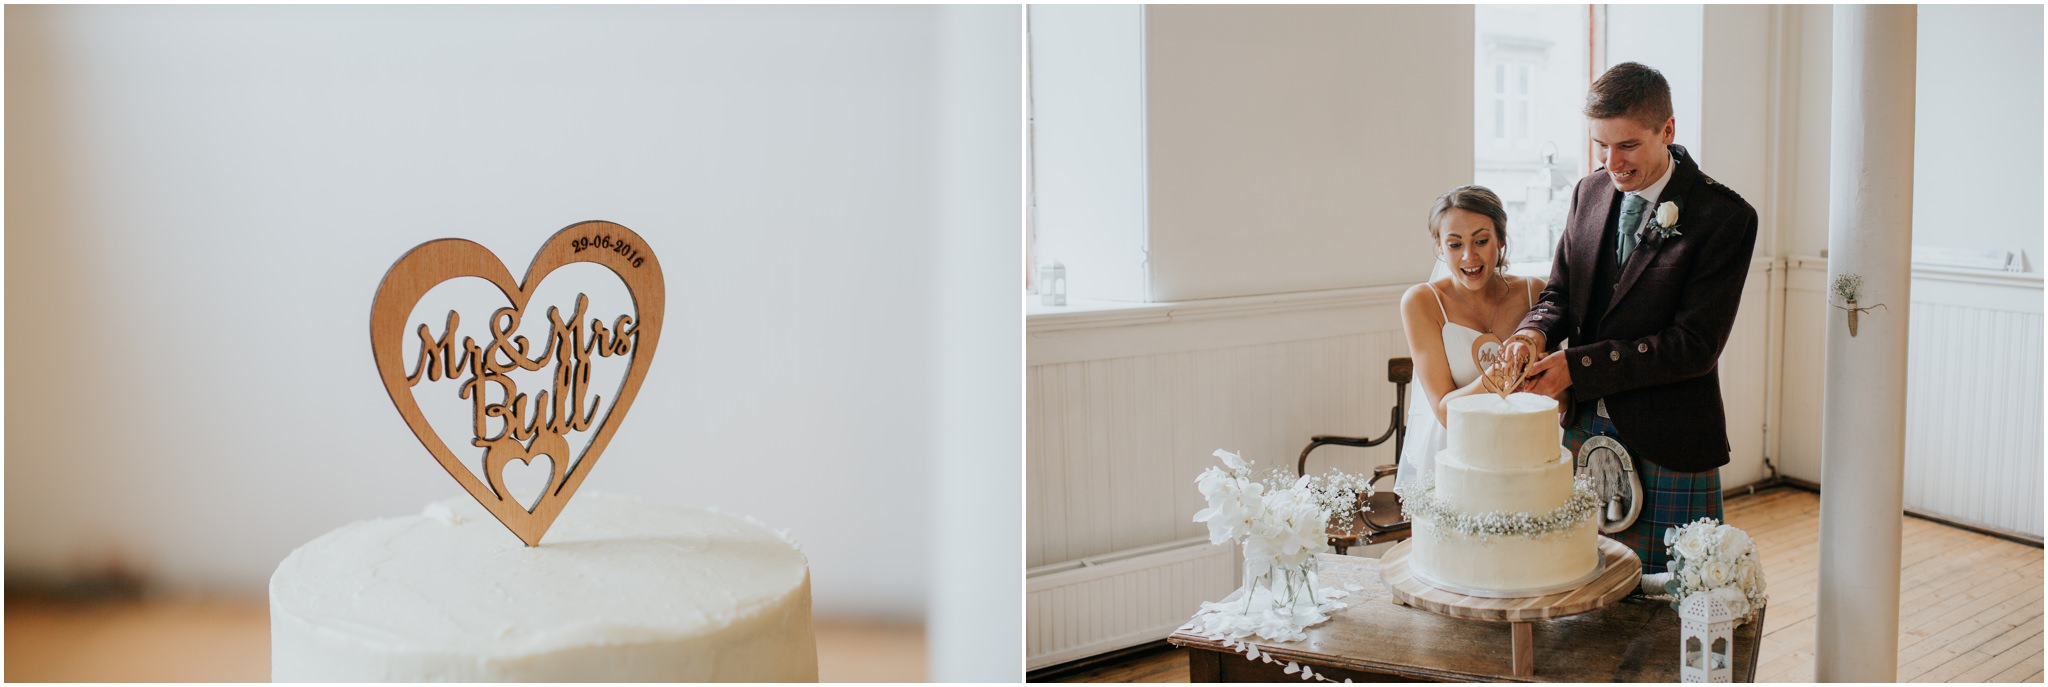 Photography 78 - Glasgow Wedding Photographer - Jordan & Abi - The Waterside Hotel, West Kilbride_0077.jpg